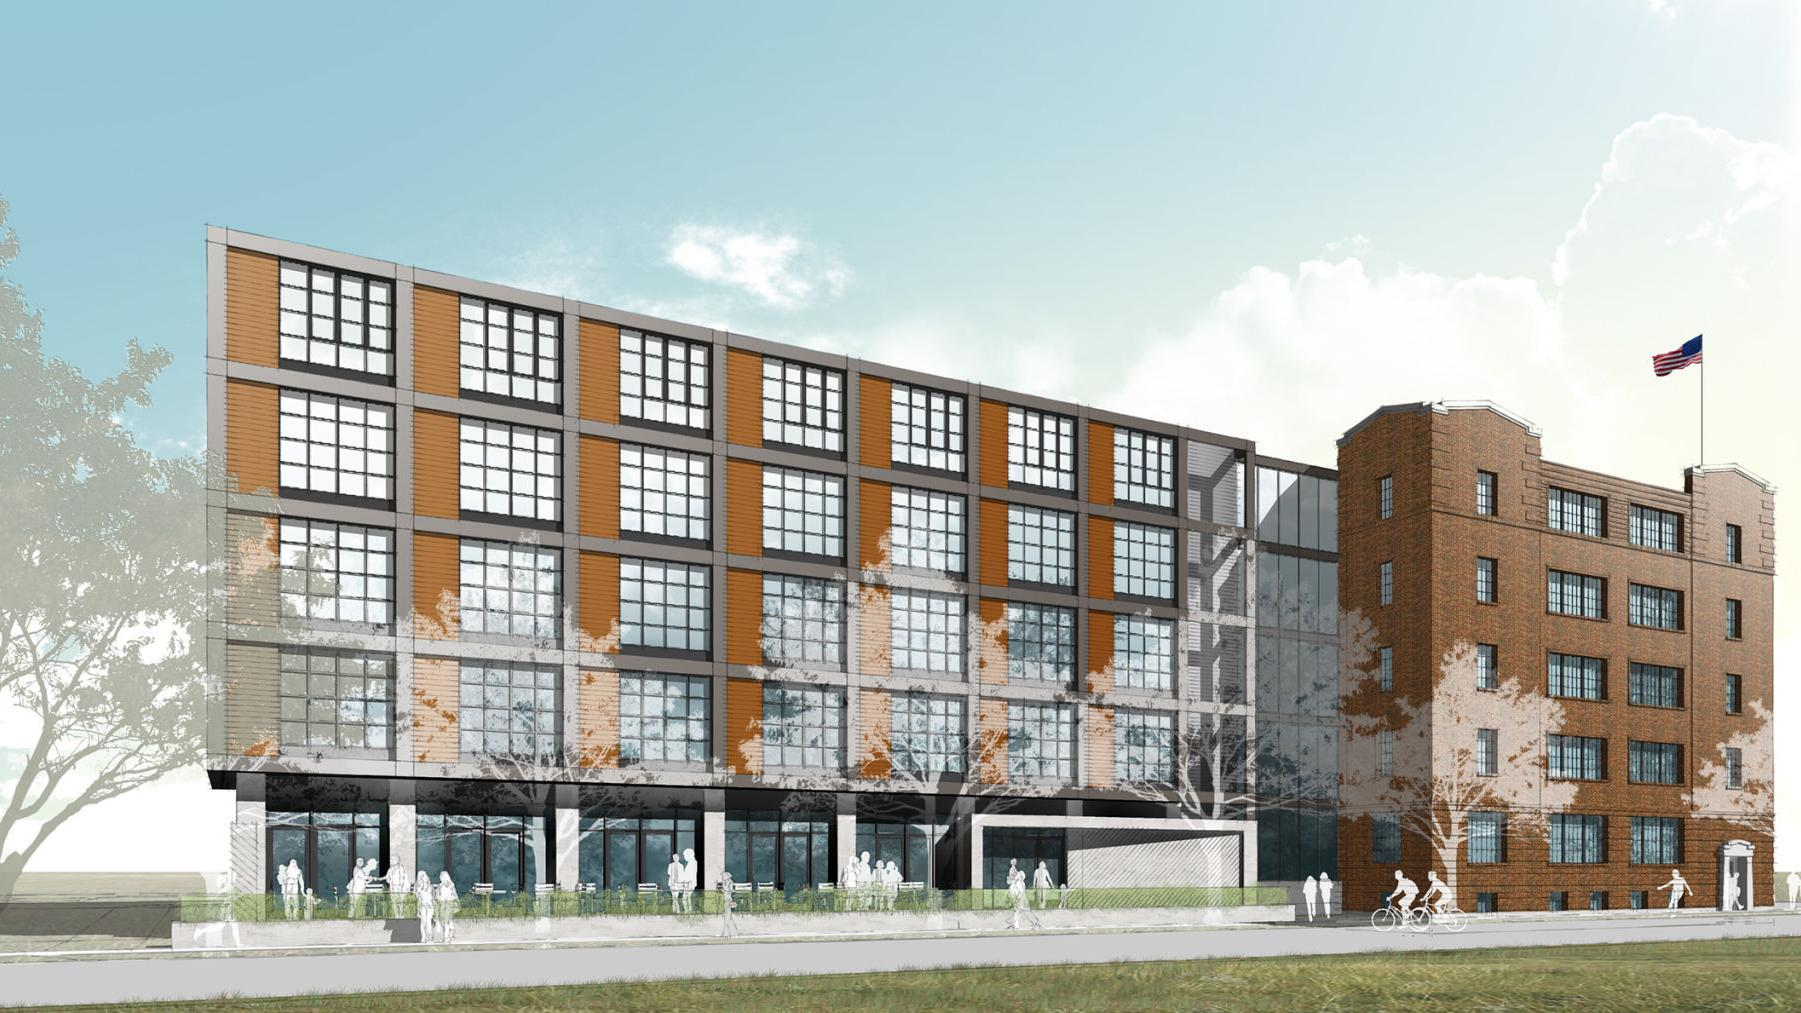 Details of proposed East Washington Avenue hotel emerge